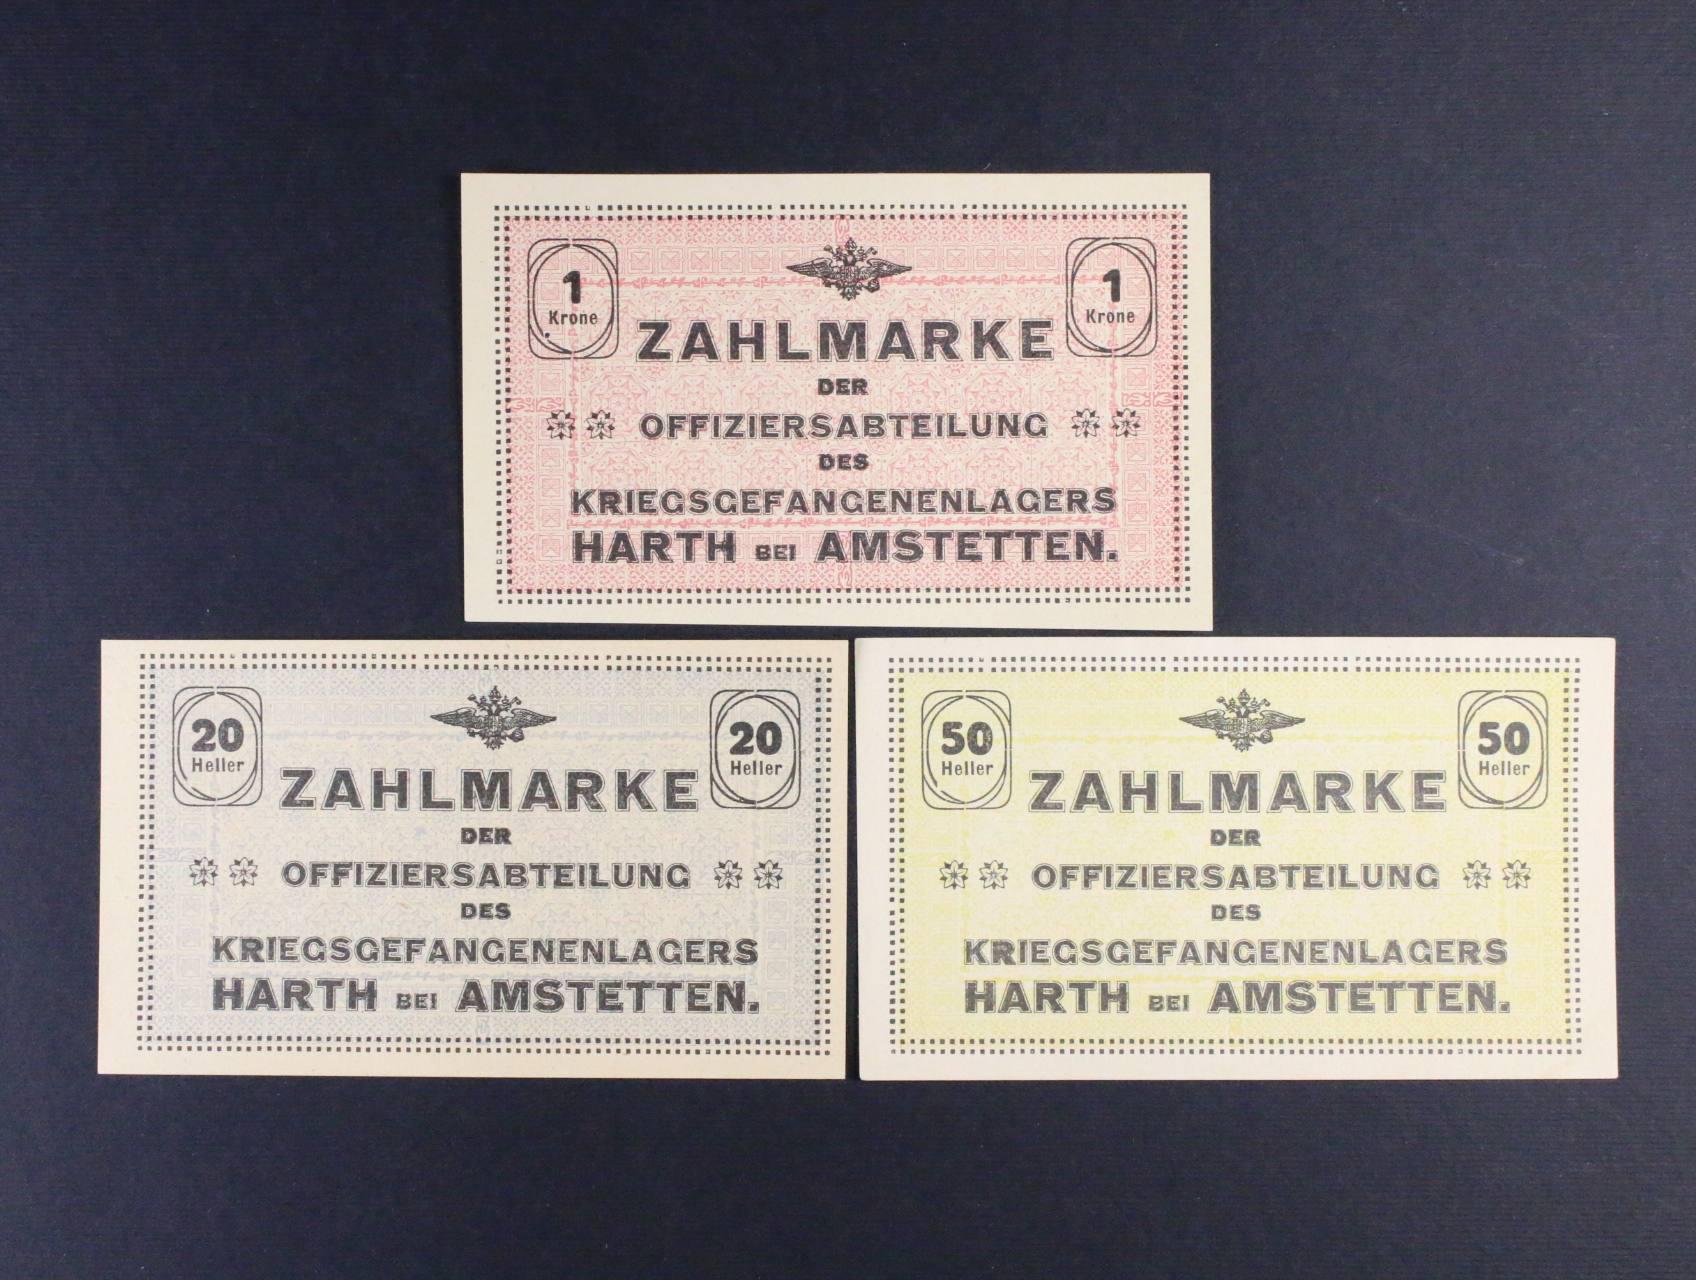 Hart bei Amstetten (Rakousko), 20, 50 h, 1  K b.d., Ri. 22.I.a, b, c